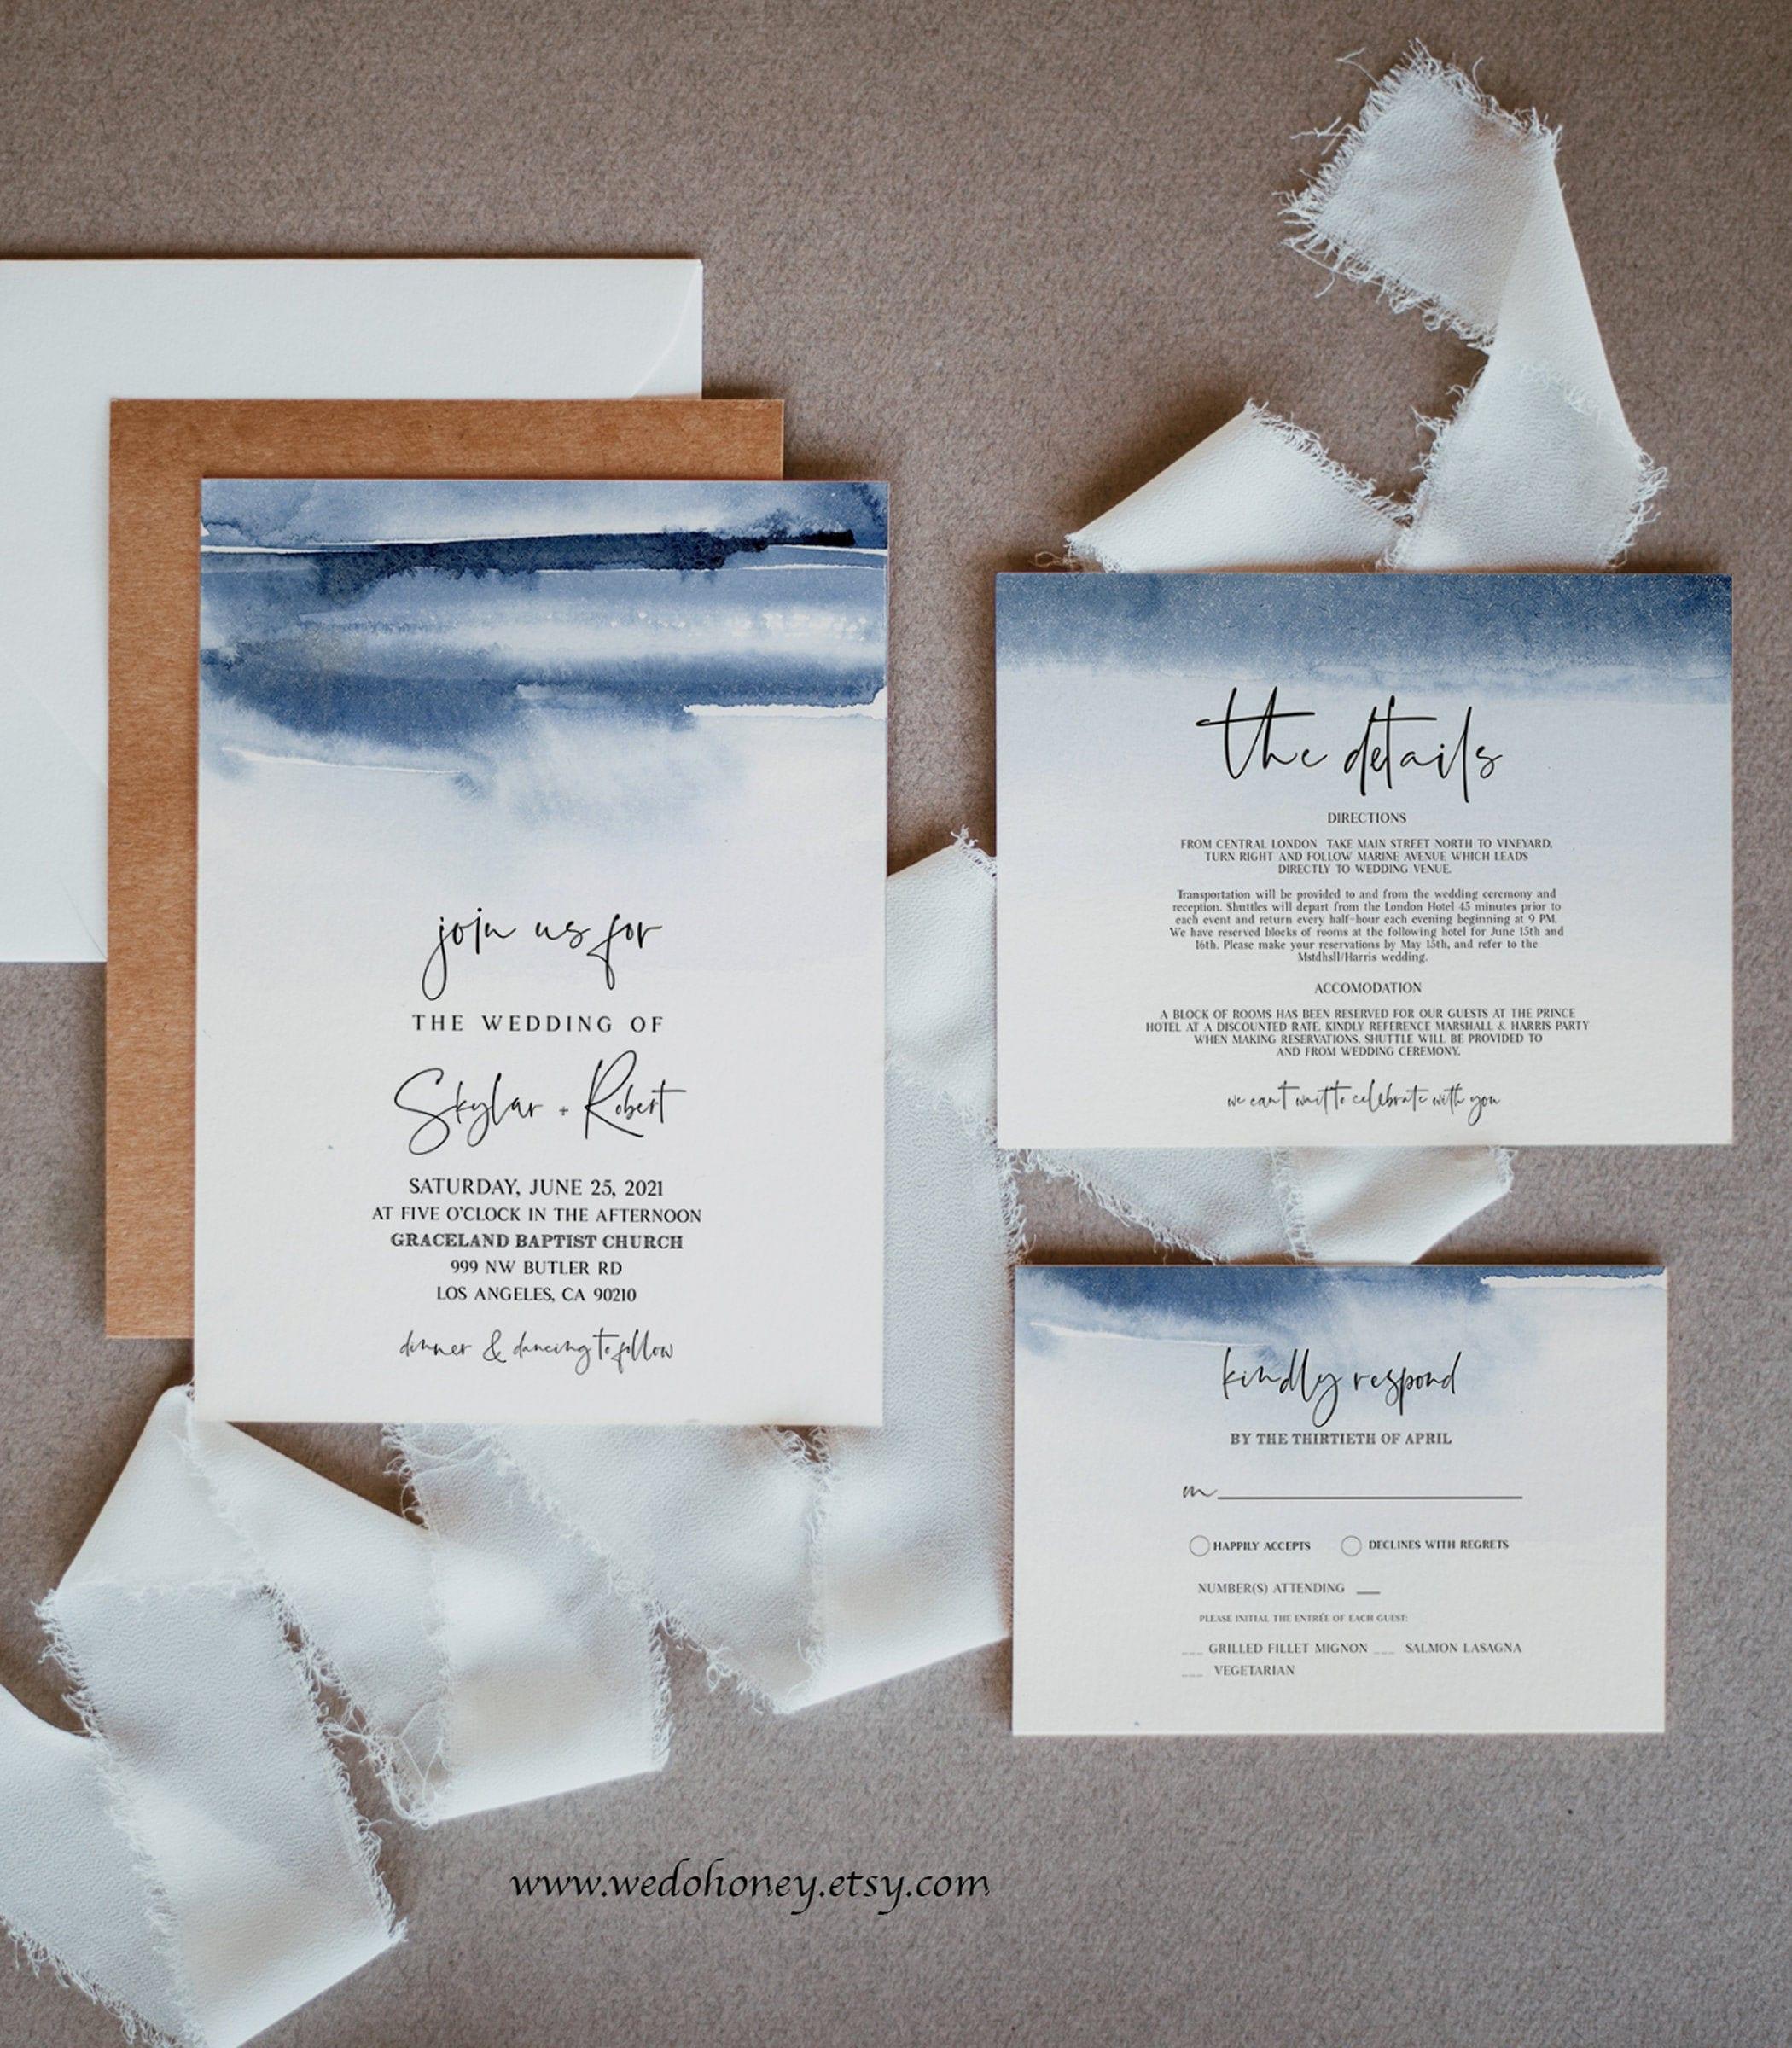 Navy Watercolor Wedding Suite Invitation Template, Blue Digital, Modernist Wedding, Editable Text with Corjl #088